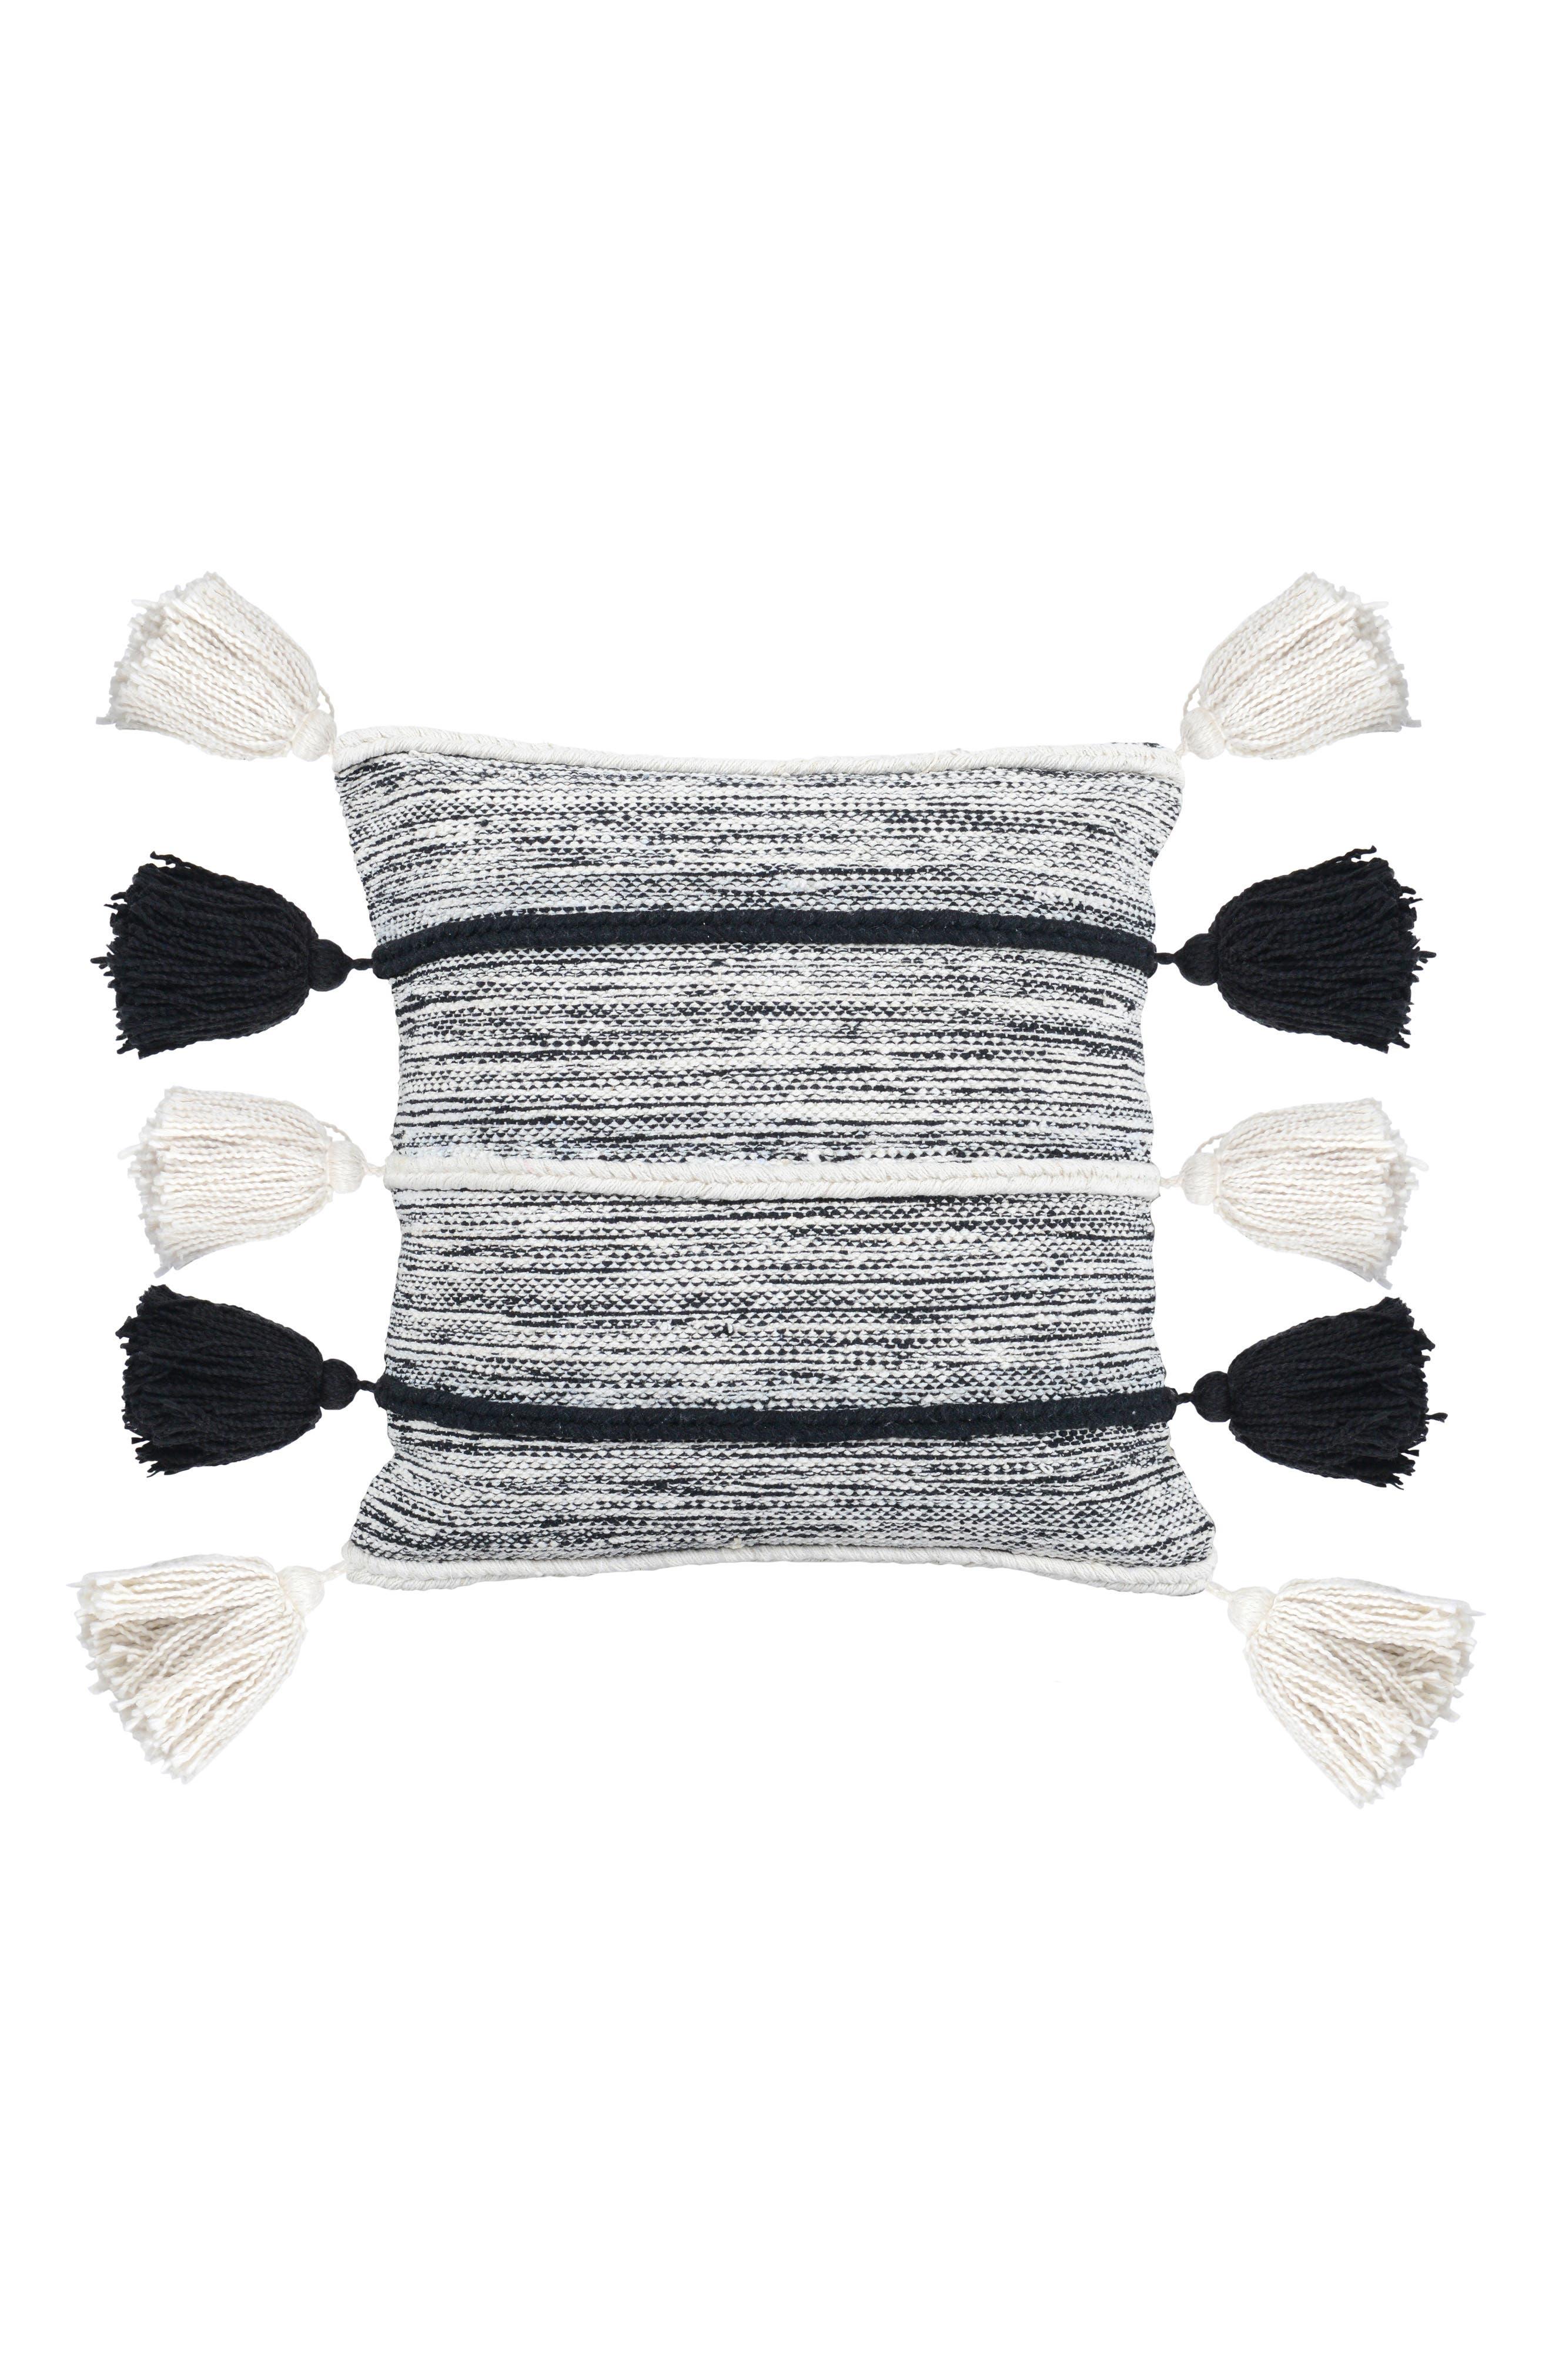 VILLA HOME COLLECTION Elan Accent Pillow, Main, color, BLACK/ IVORY